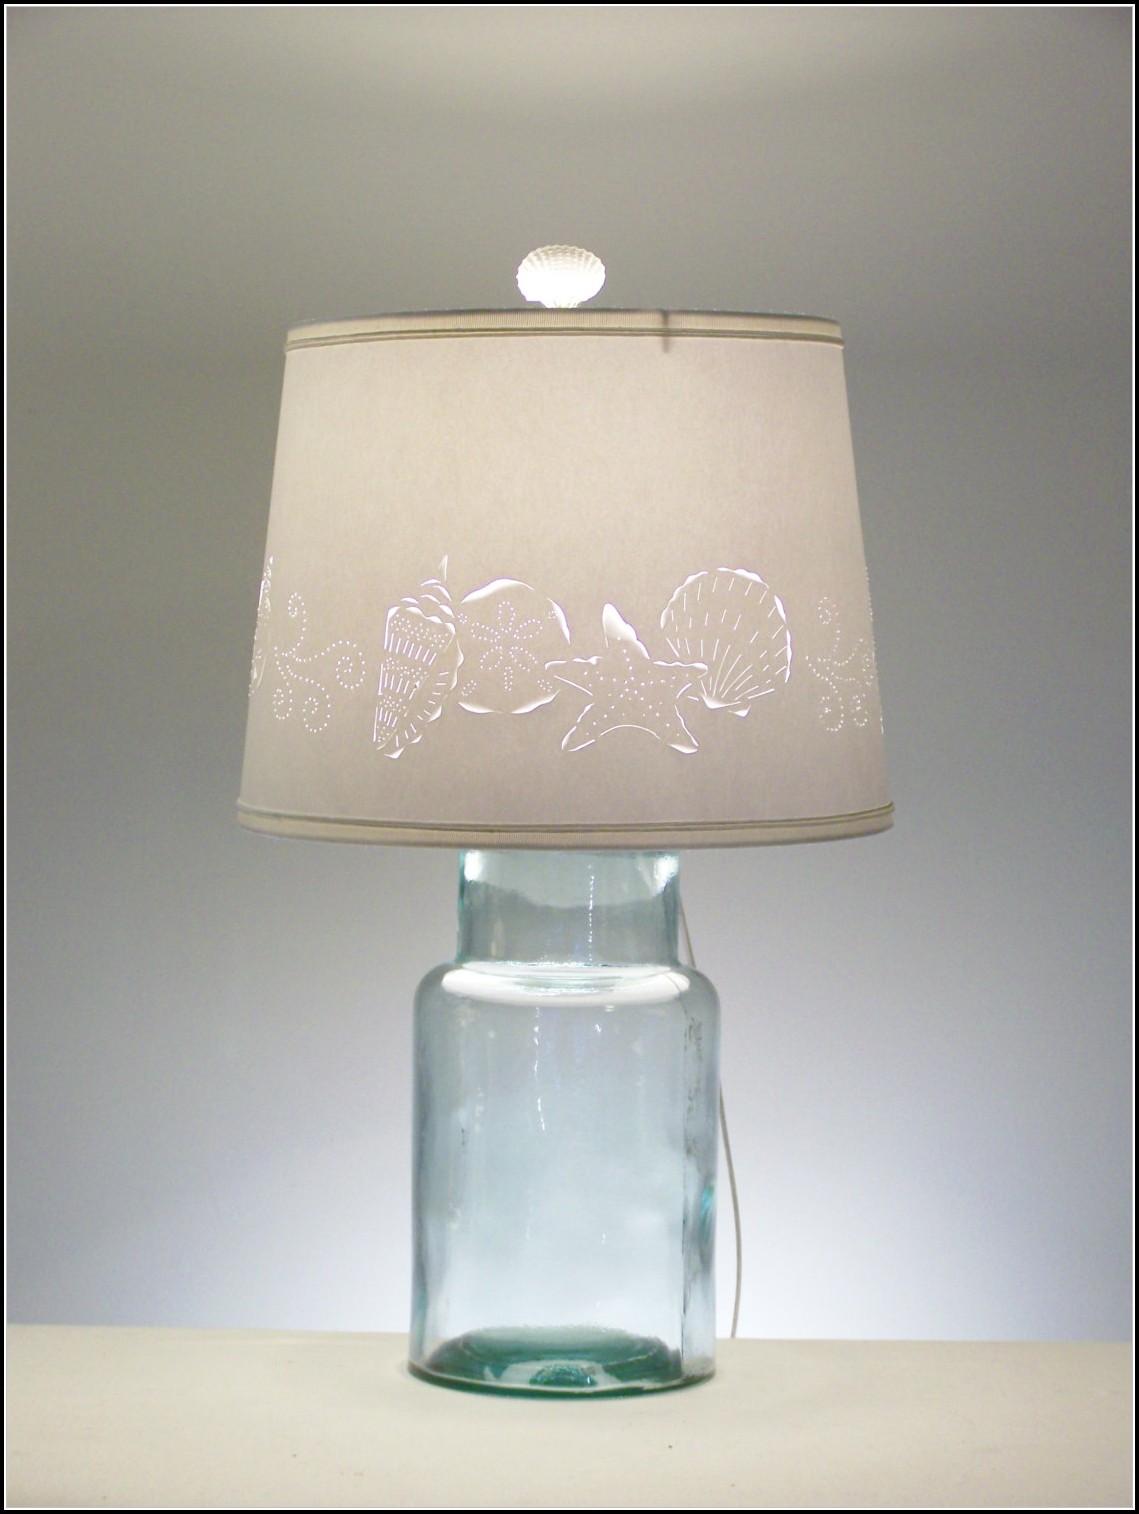 Fillable Glass Jar Table Lamp